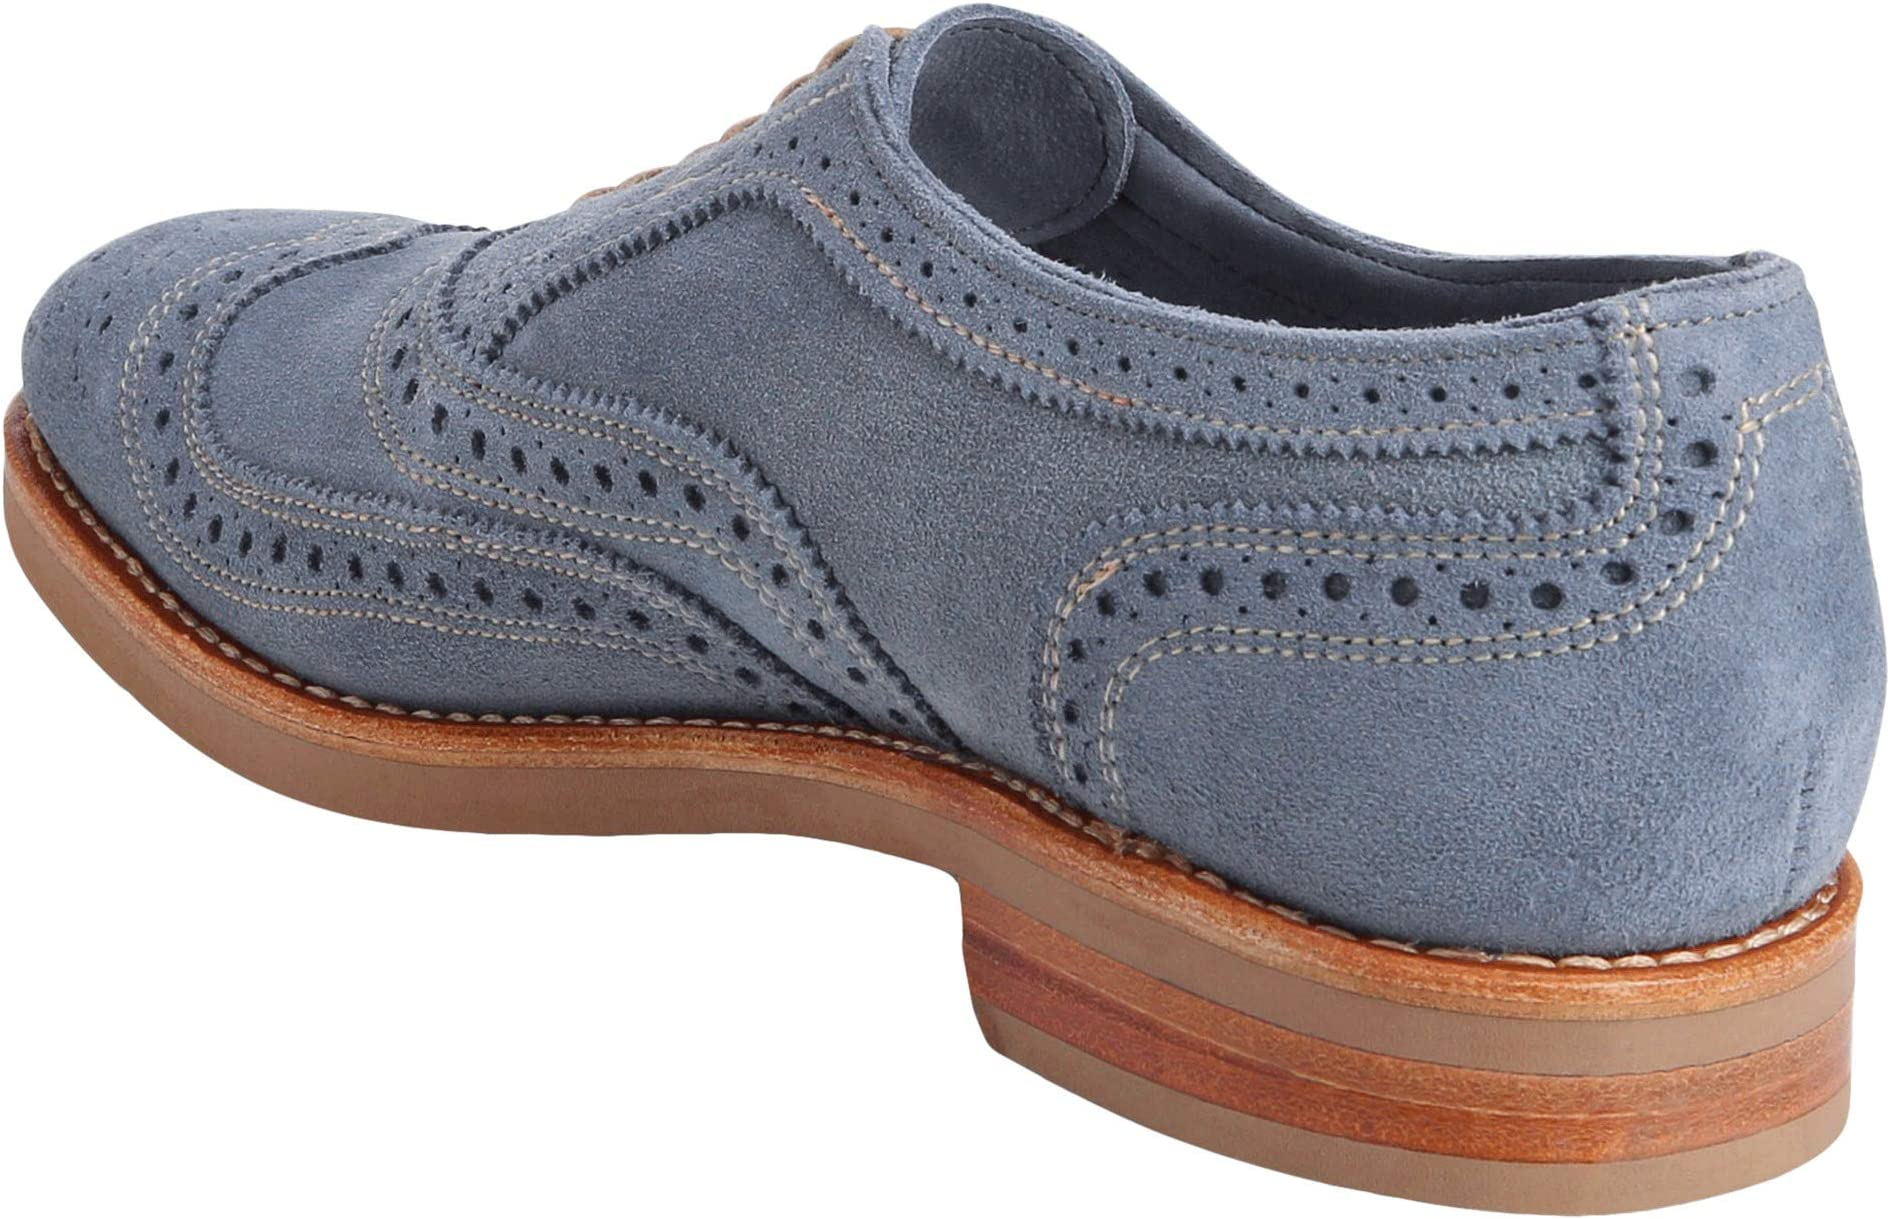 Allen Edmonds Neumok   Men's shoes   2020 Newest